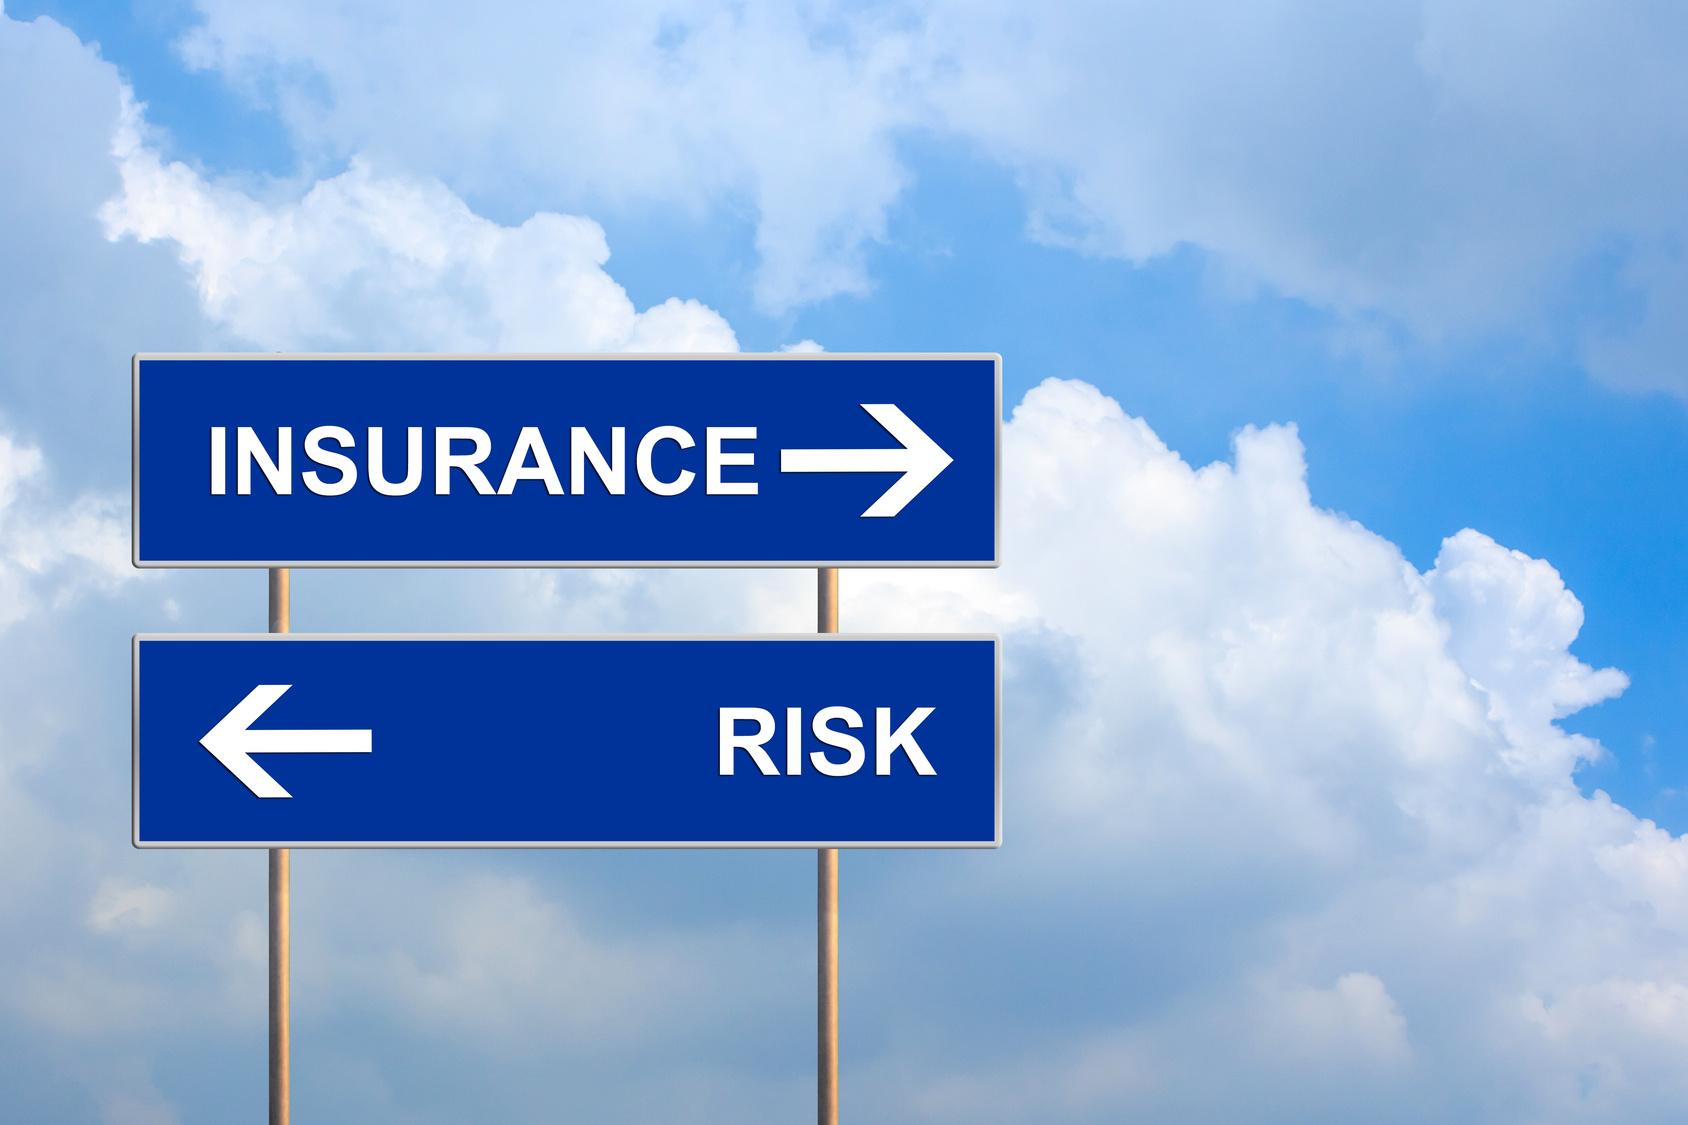 E&O Insurance 101 - Personal Insurance Business insurance -